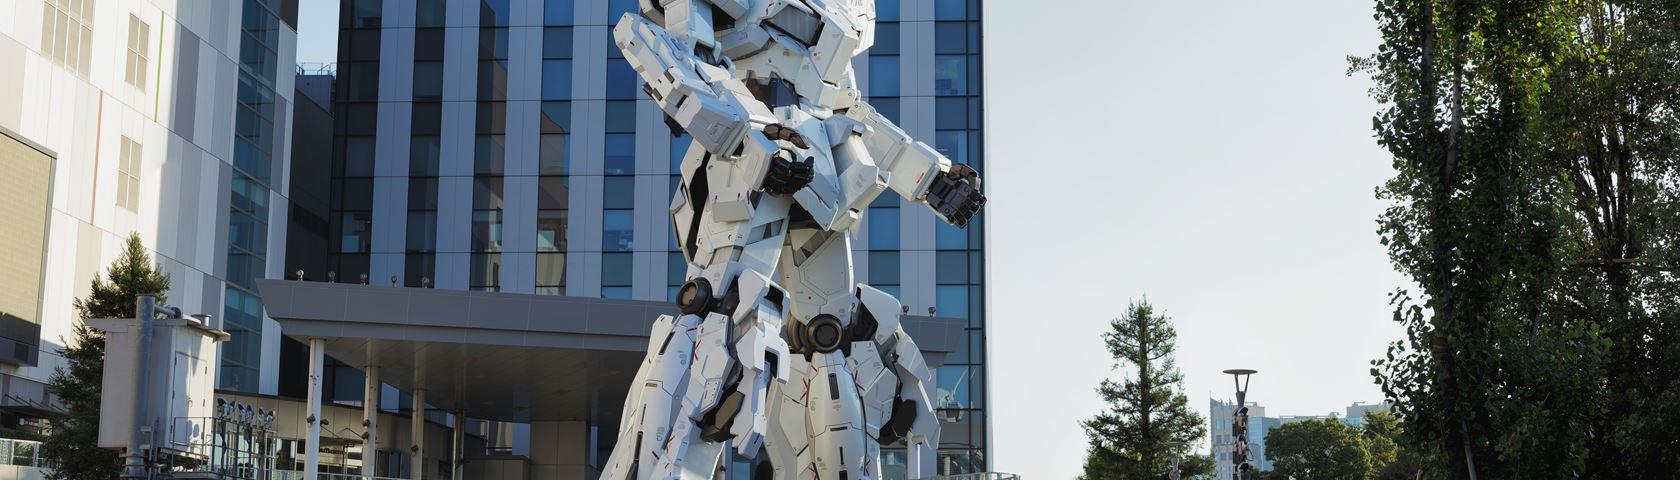 RX-0 Gundam